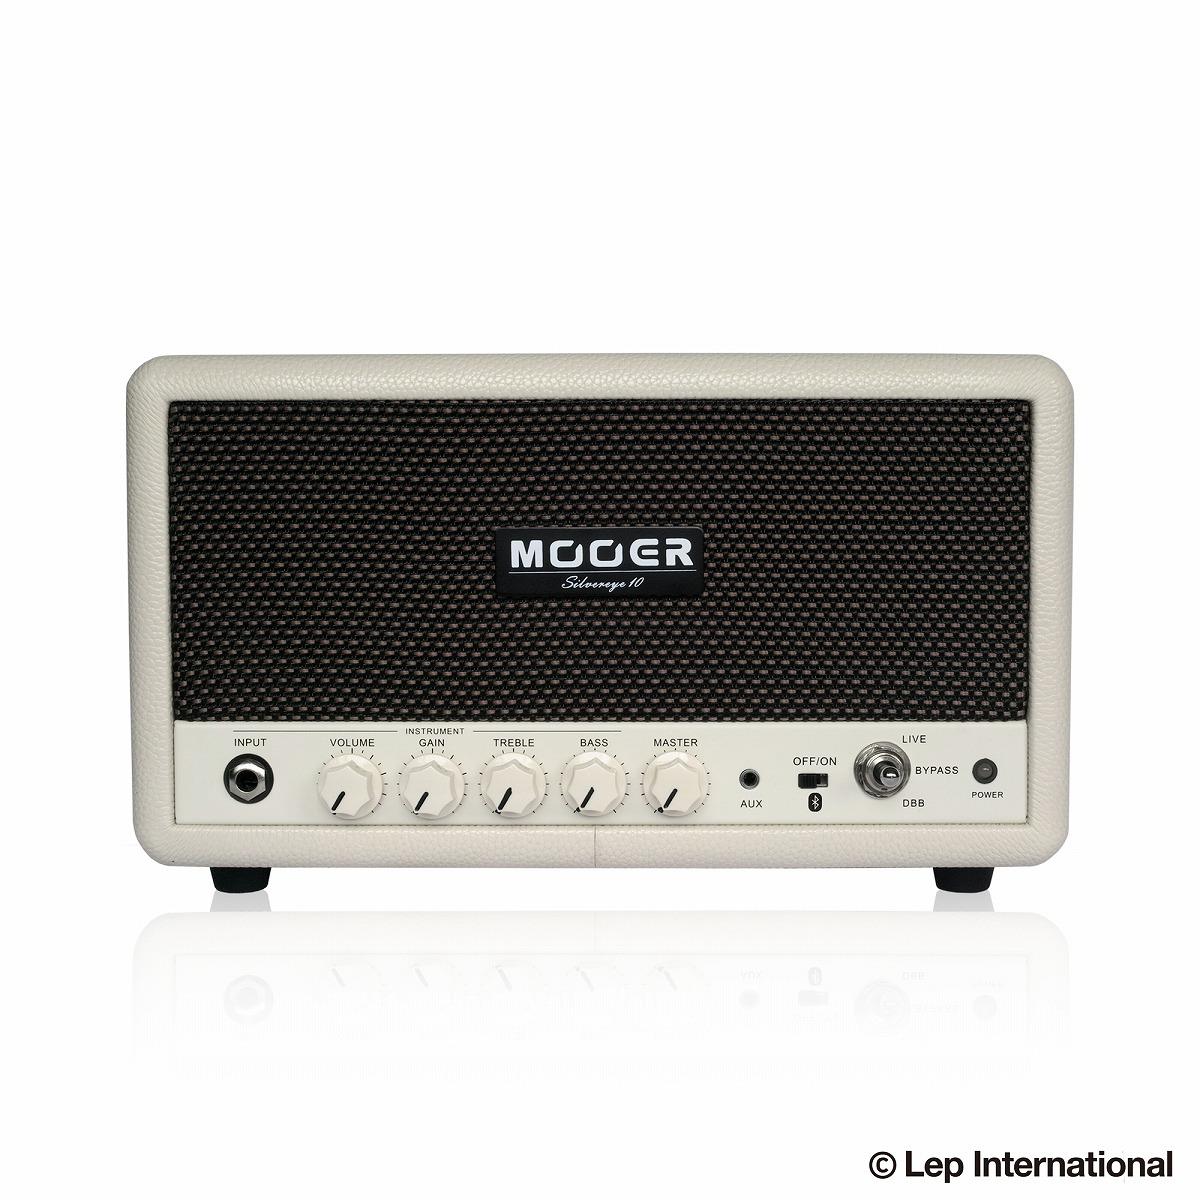 Mooer Silvereye 10 / 多機能プラクティスアンプ! 10W ハイクオリティBluetoothオーディオ × ギターアンプ!